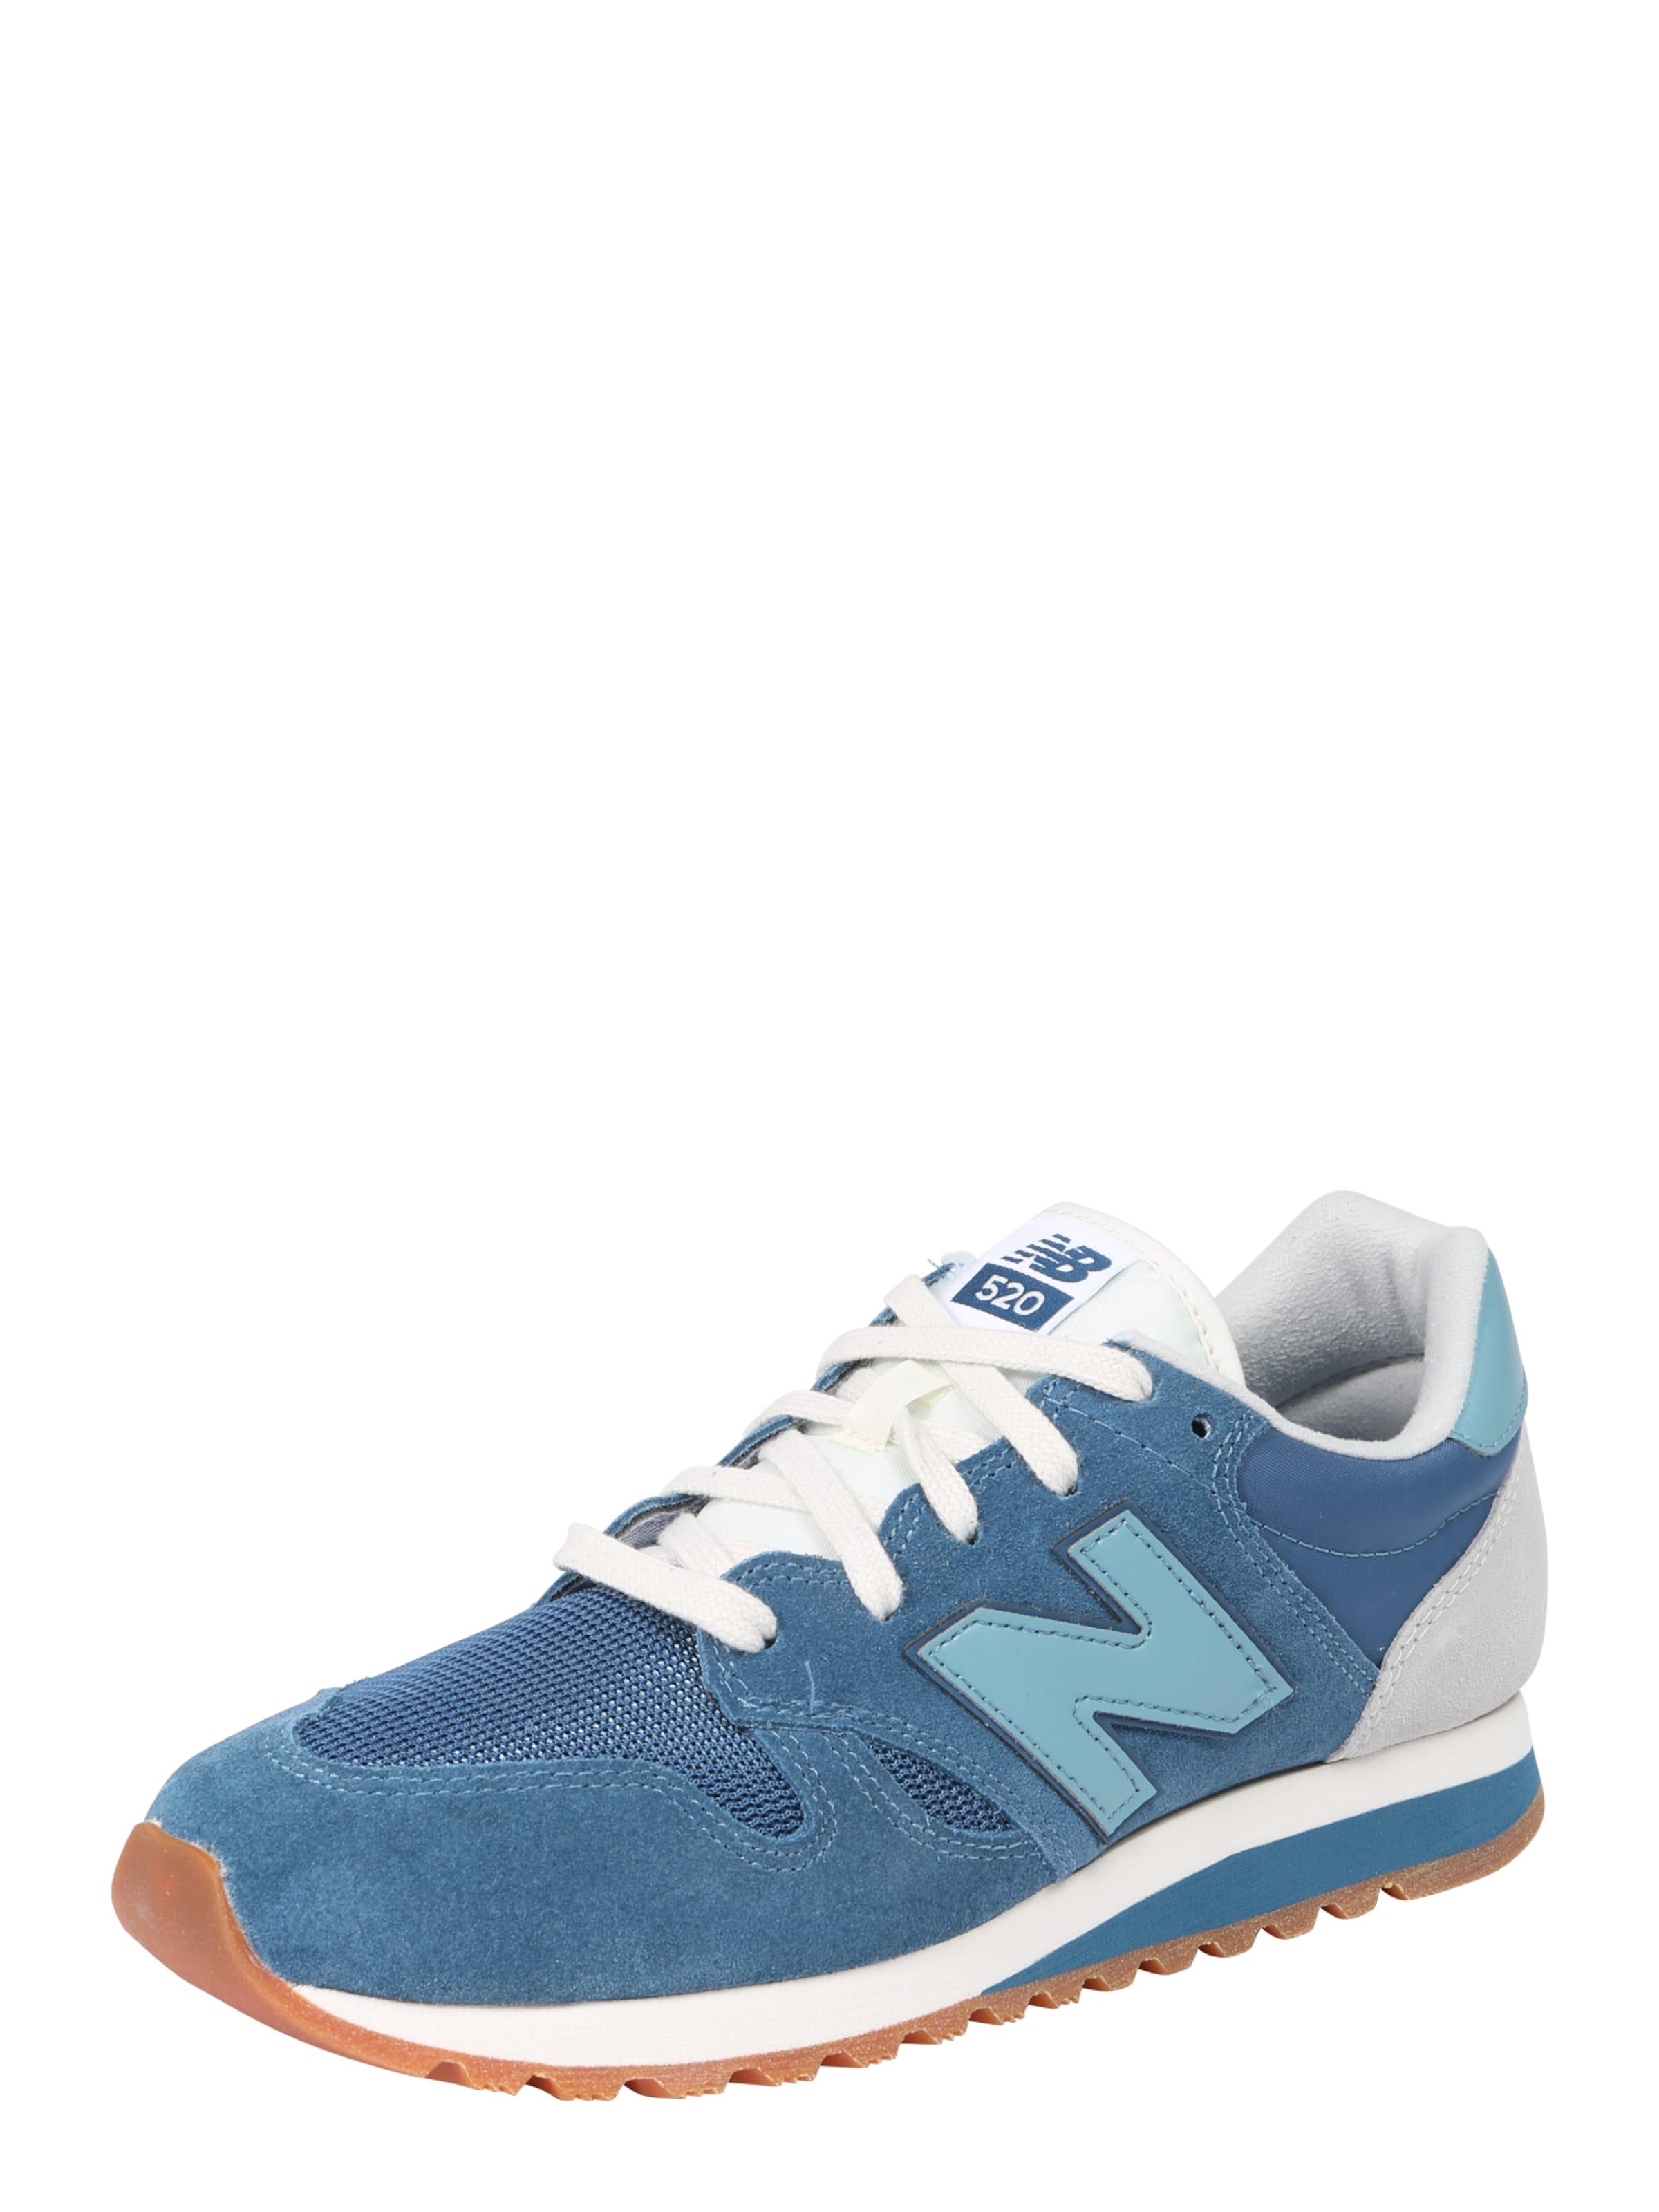 Haltbare Mode billige Schuhe new balance | Sneaker 'U520' 'U520' 'U520' Schuhe Gut getragene Schuhe 99e775